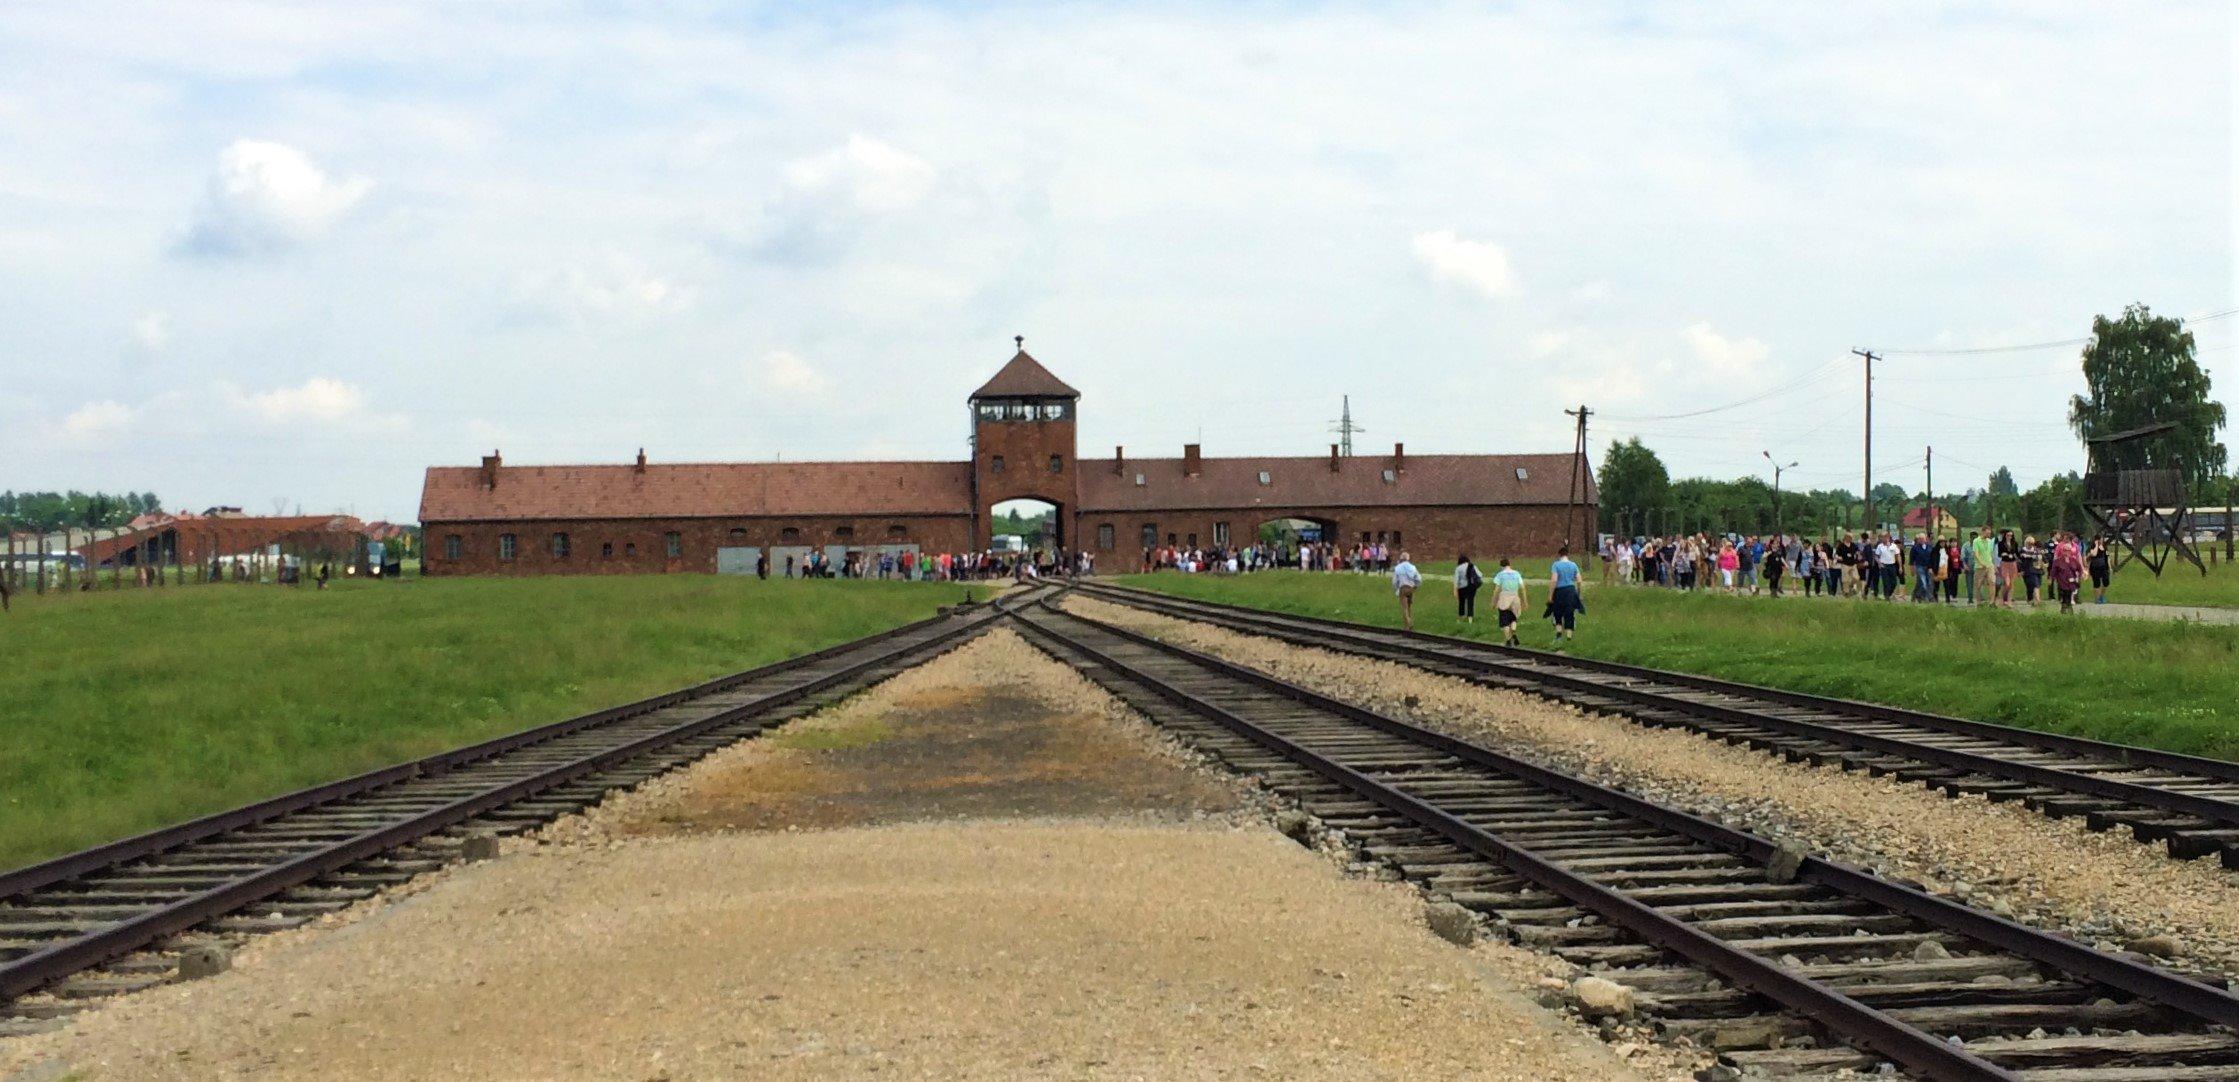 Krakow Auschwitz